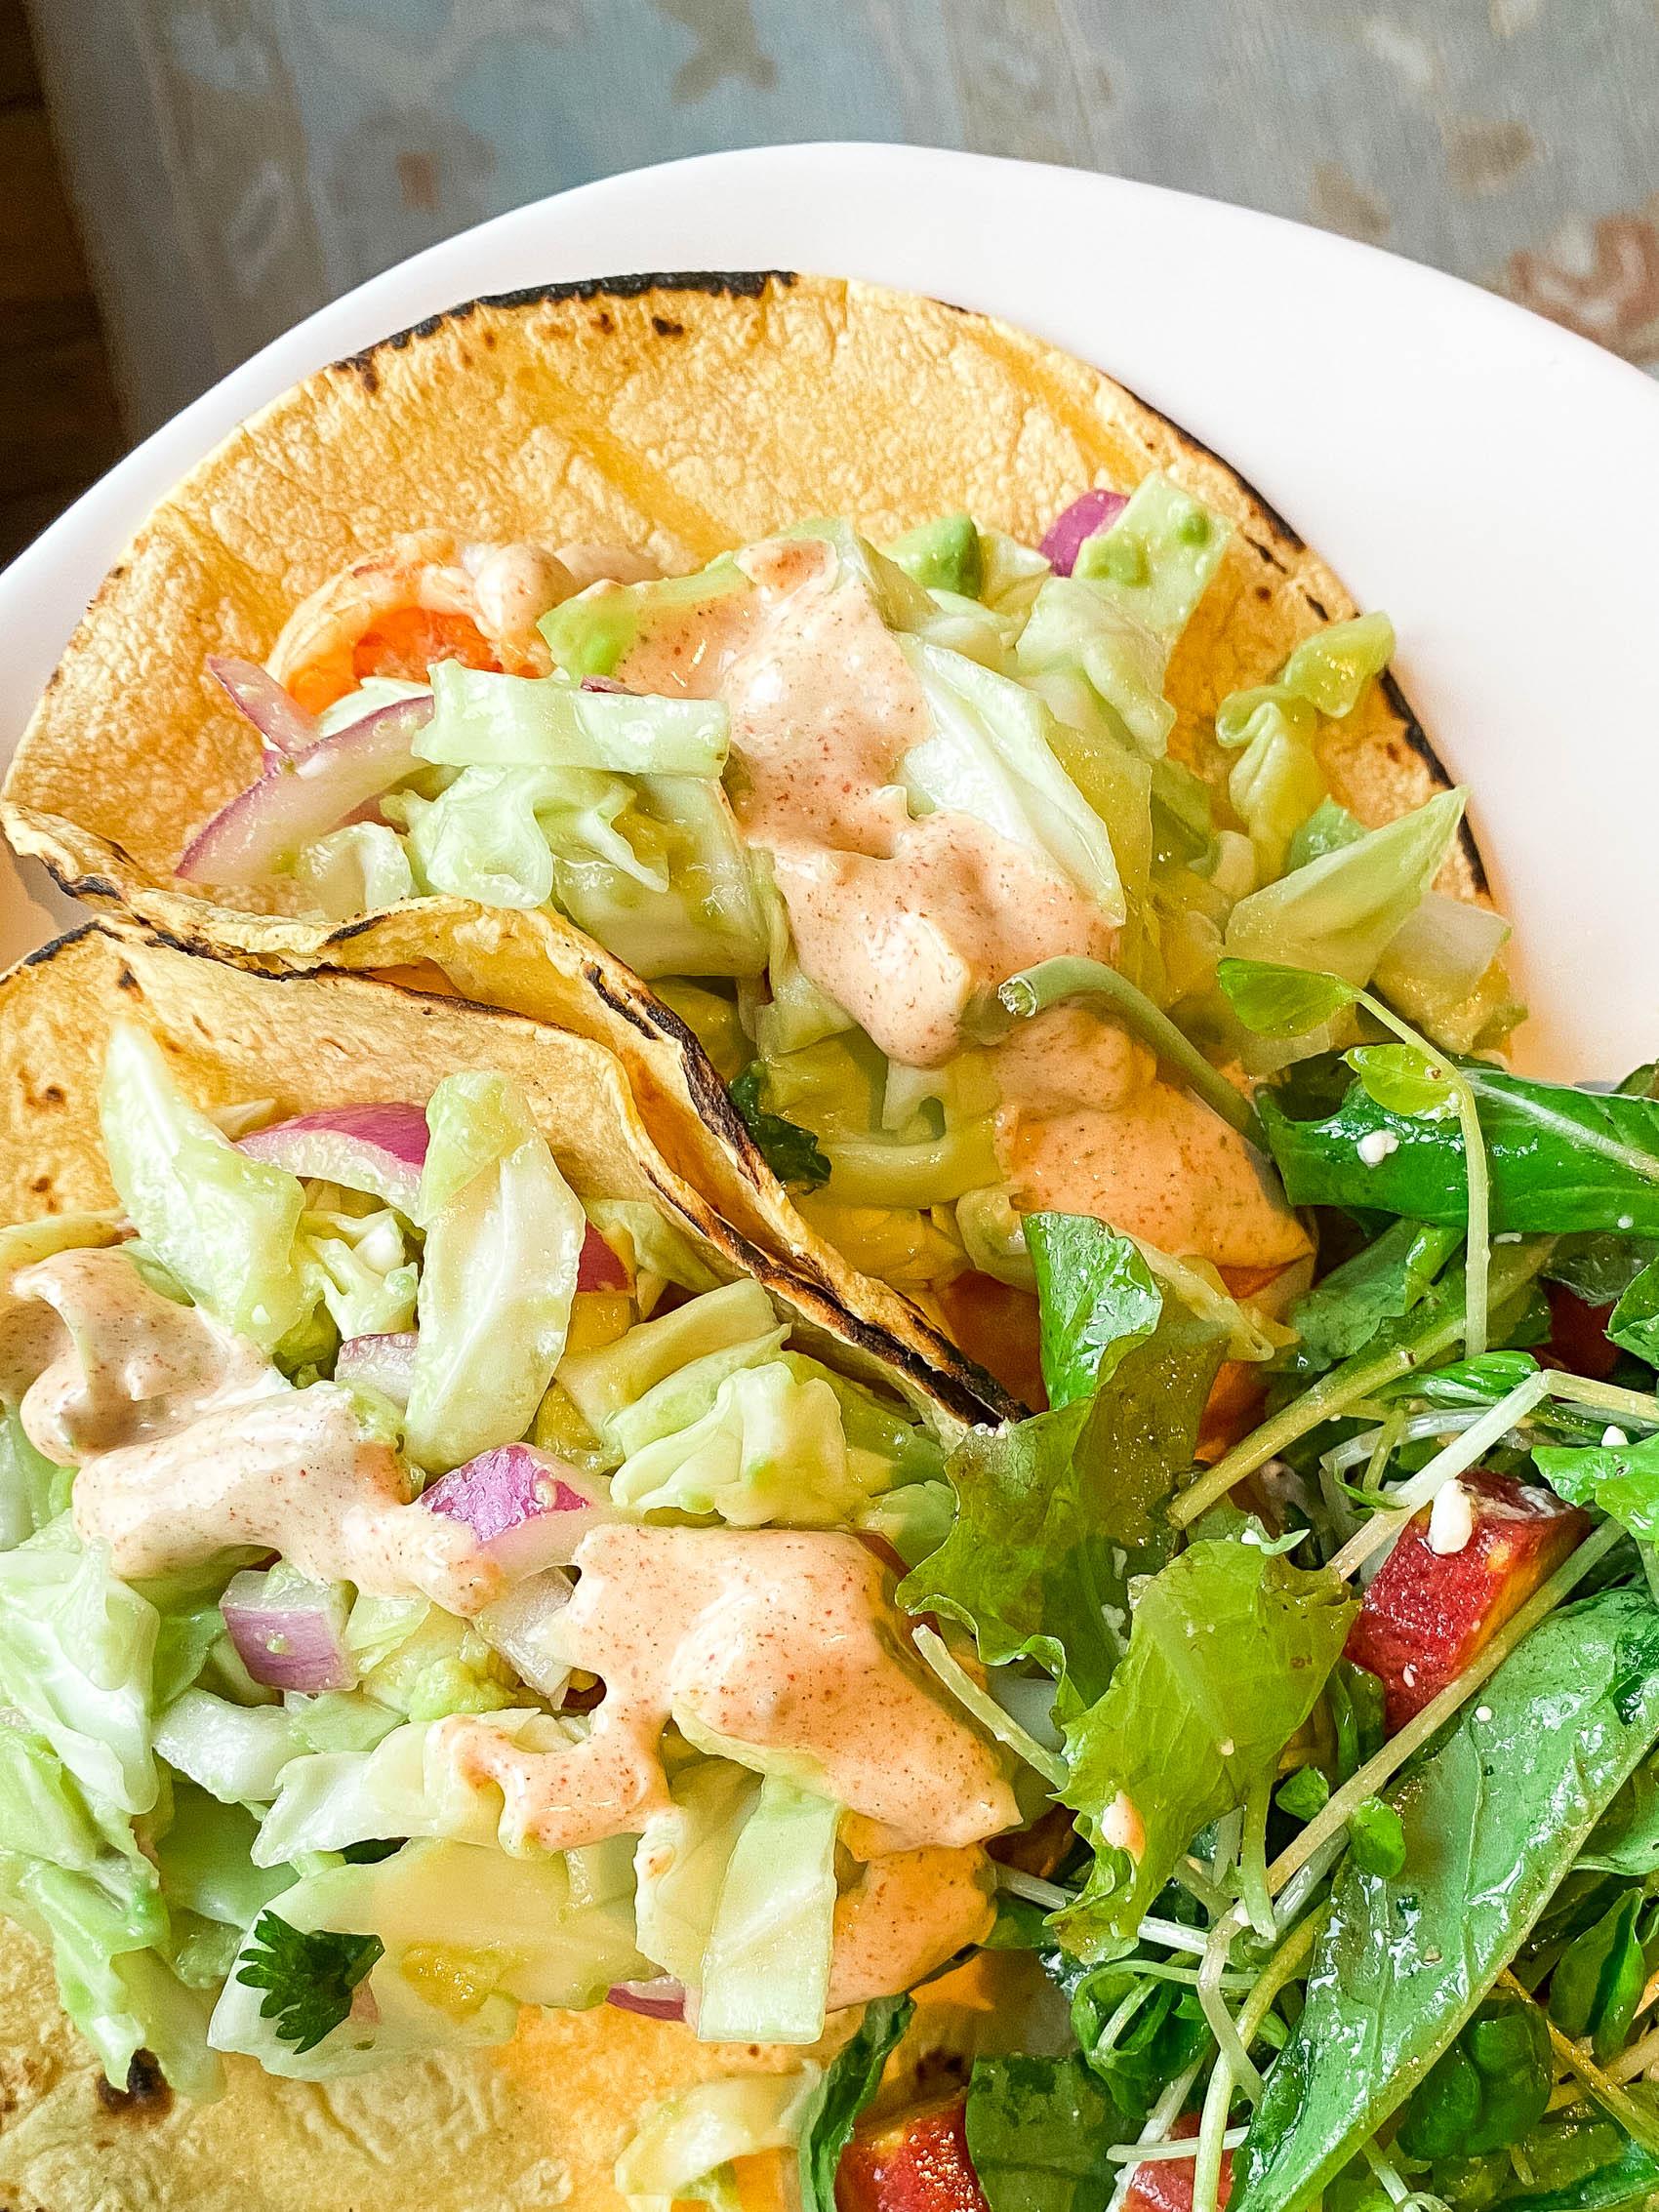 Delish's Cilantro Lime Shrimp Tacos